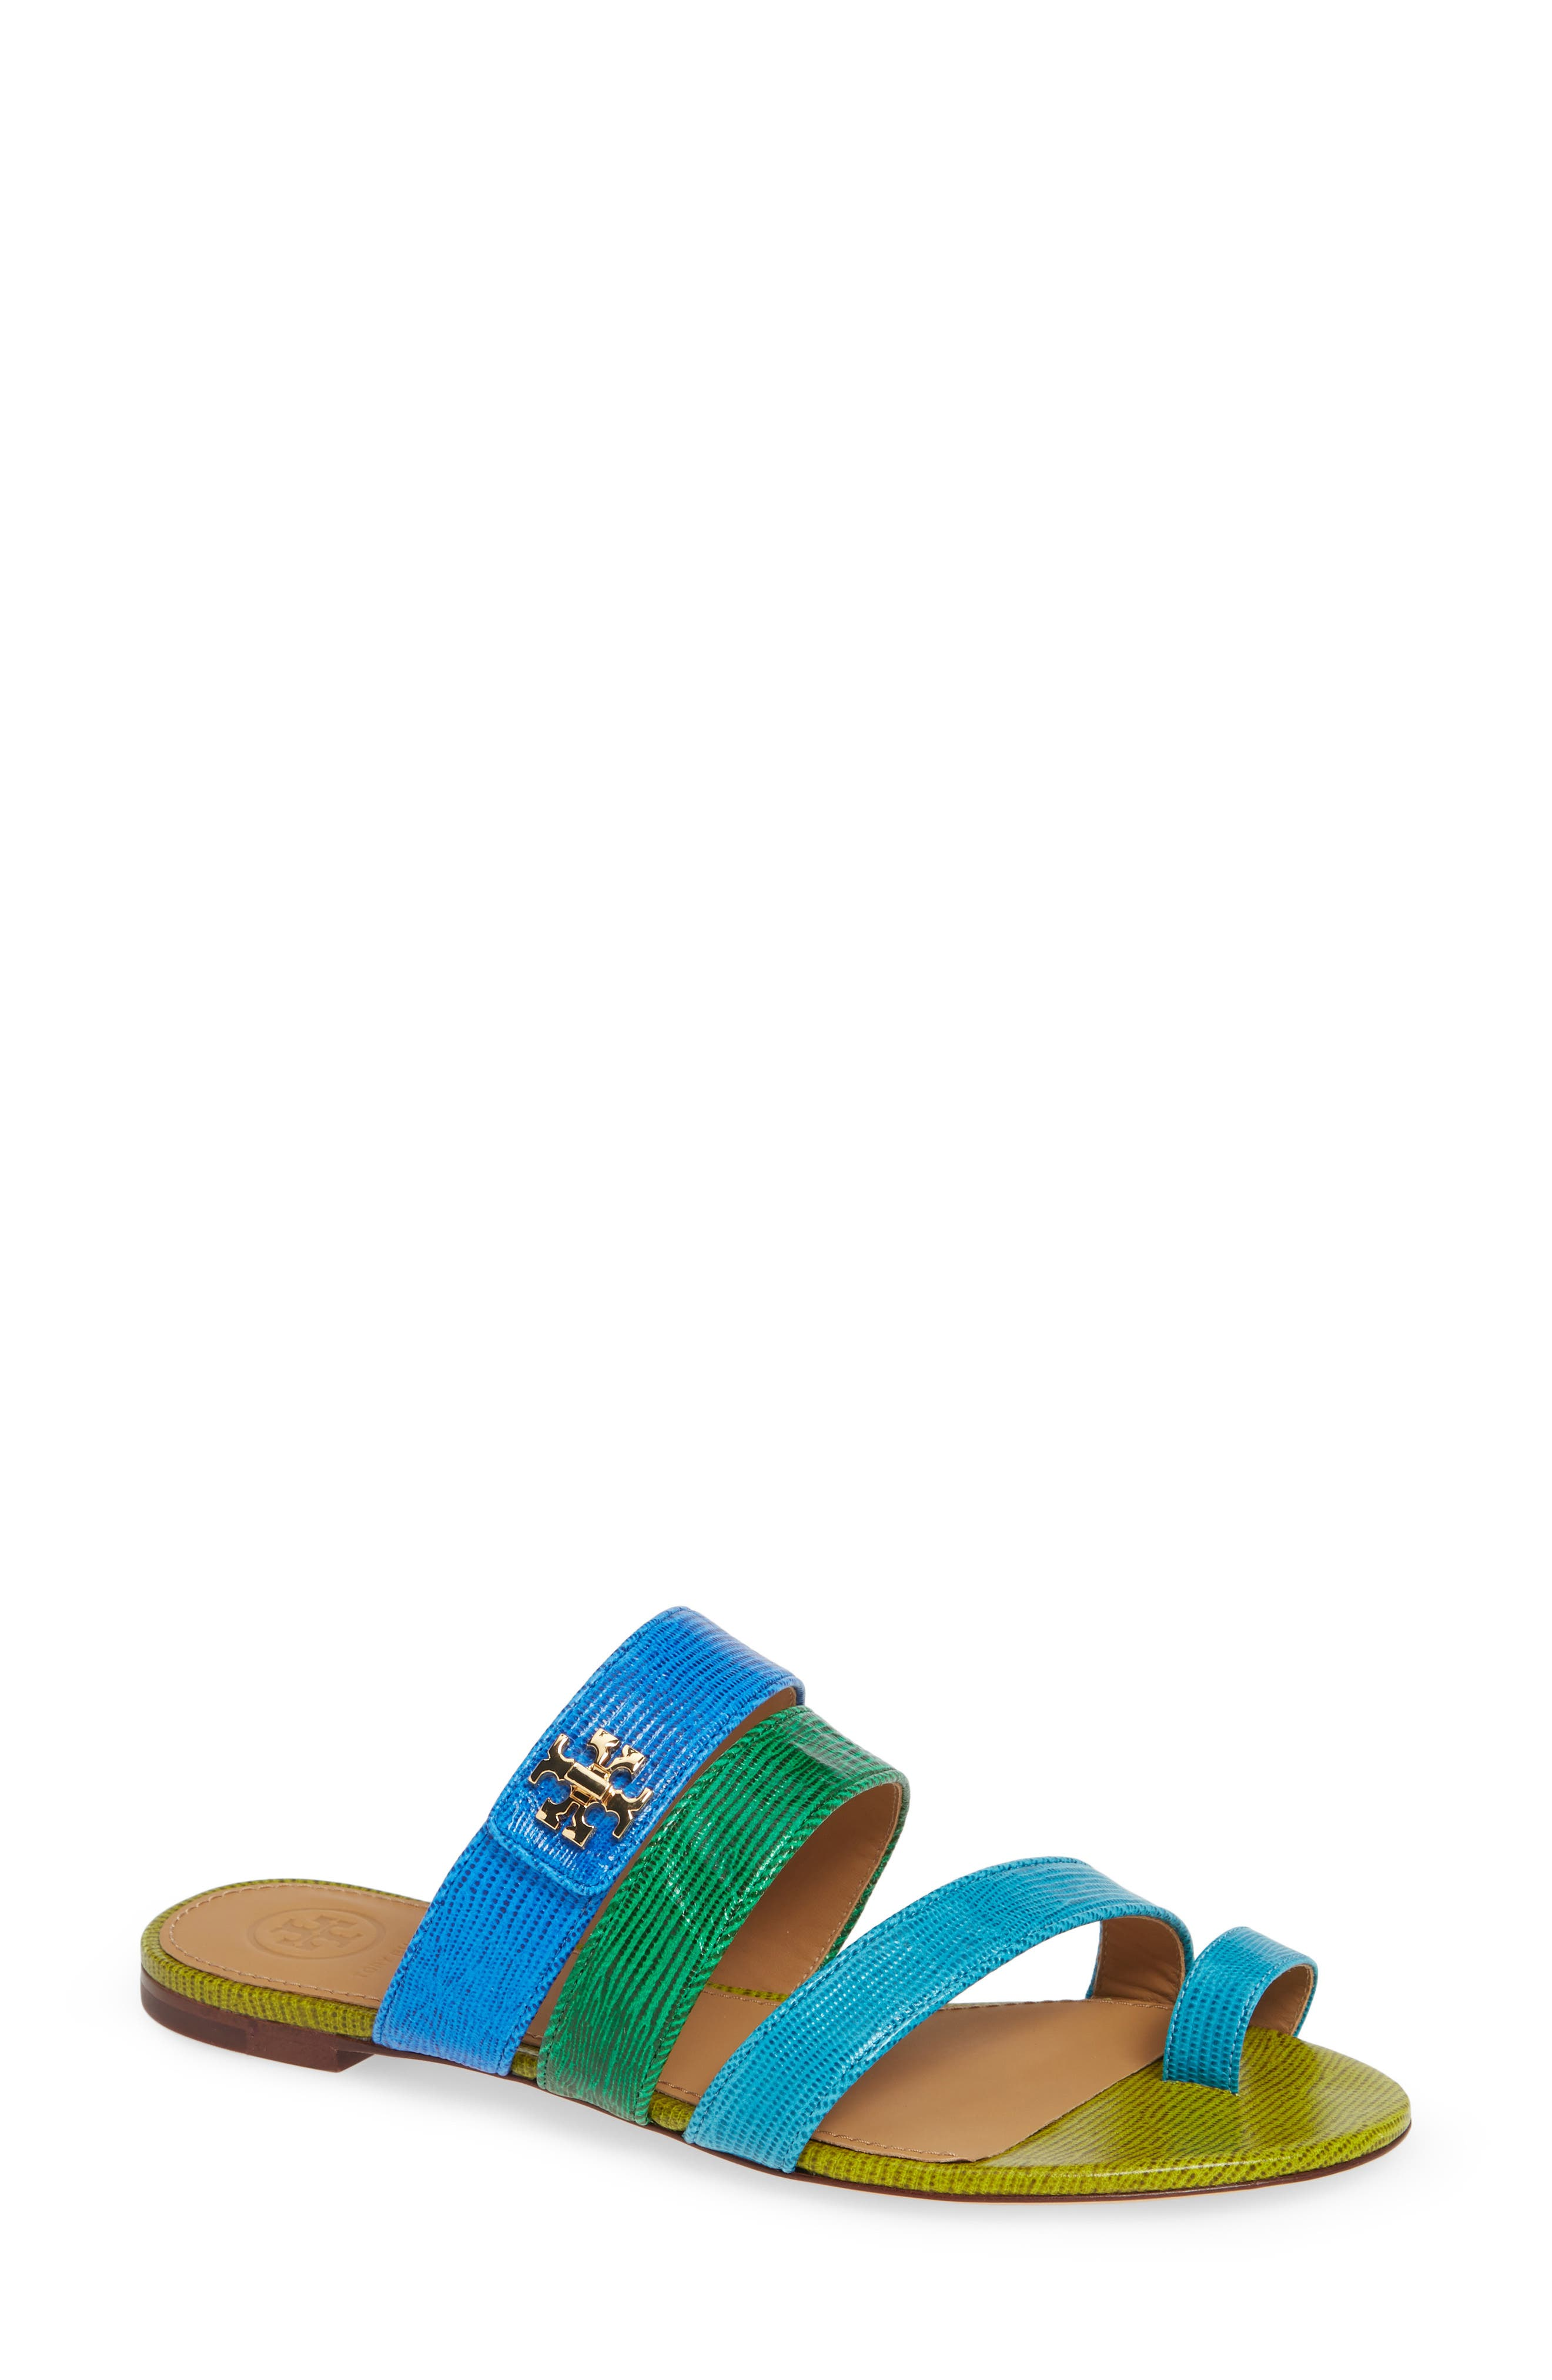 Tory Burch Kira Toe Ring Sandal- Blue